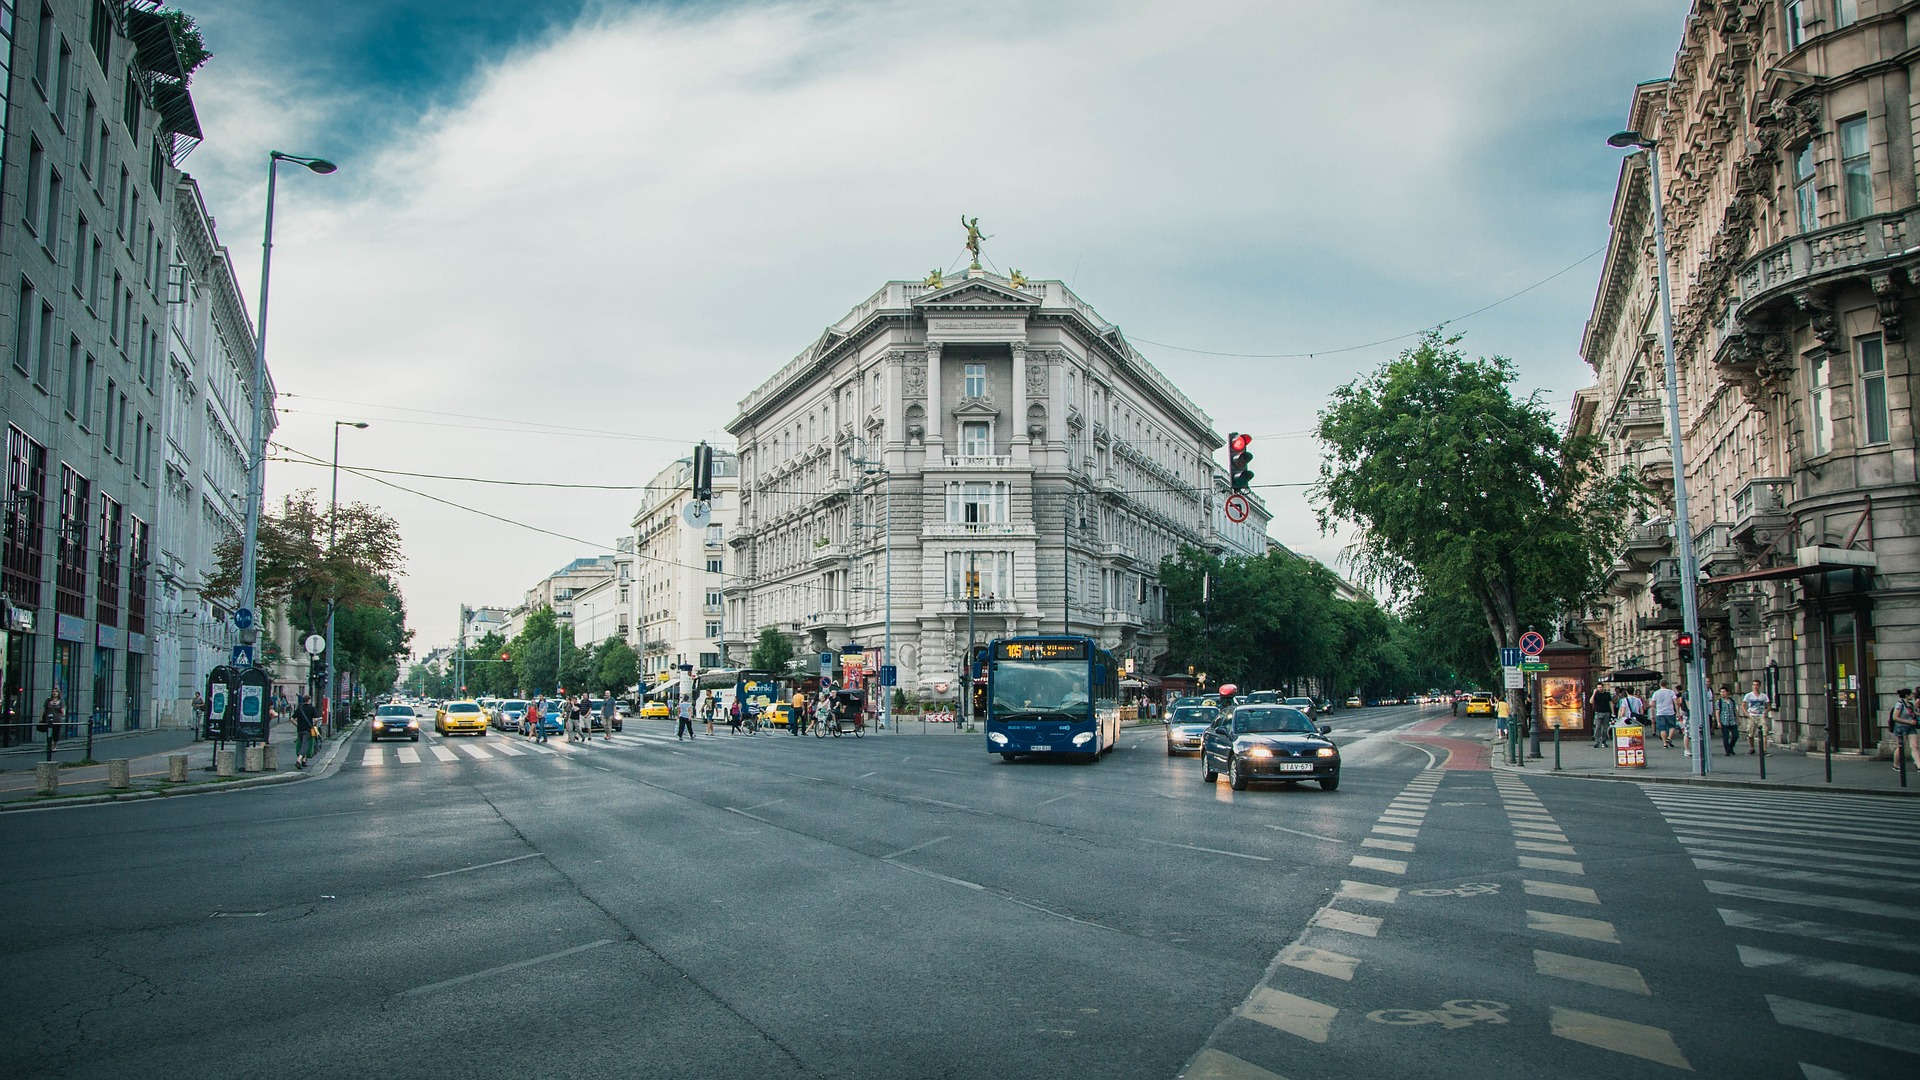 city-street-1149159_1920